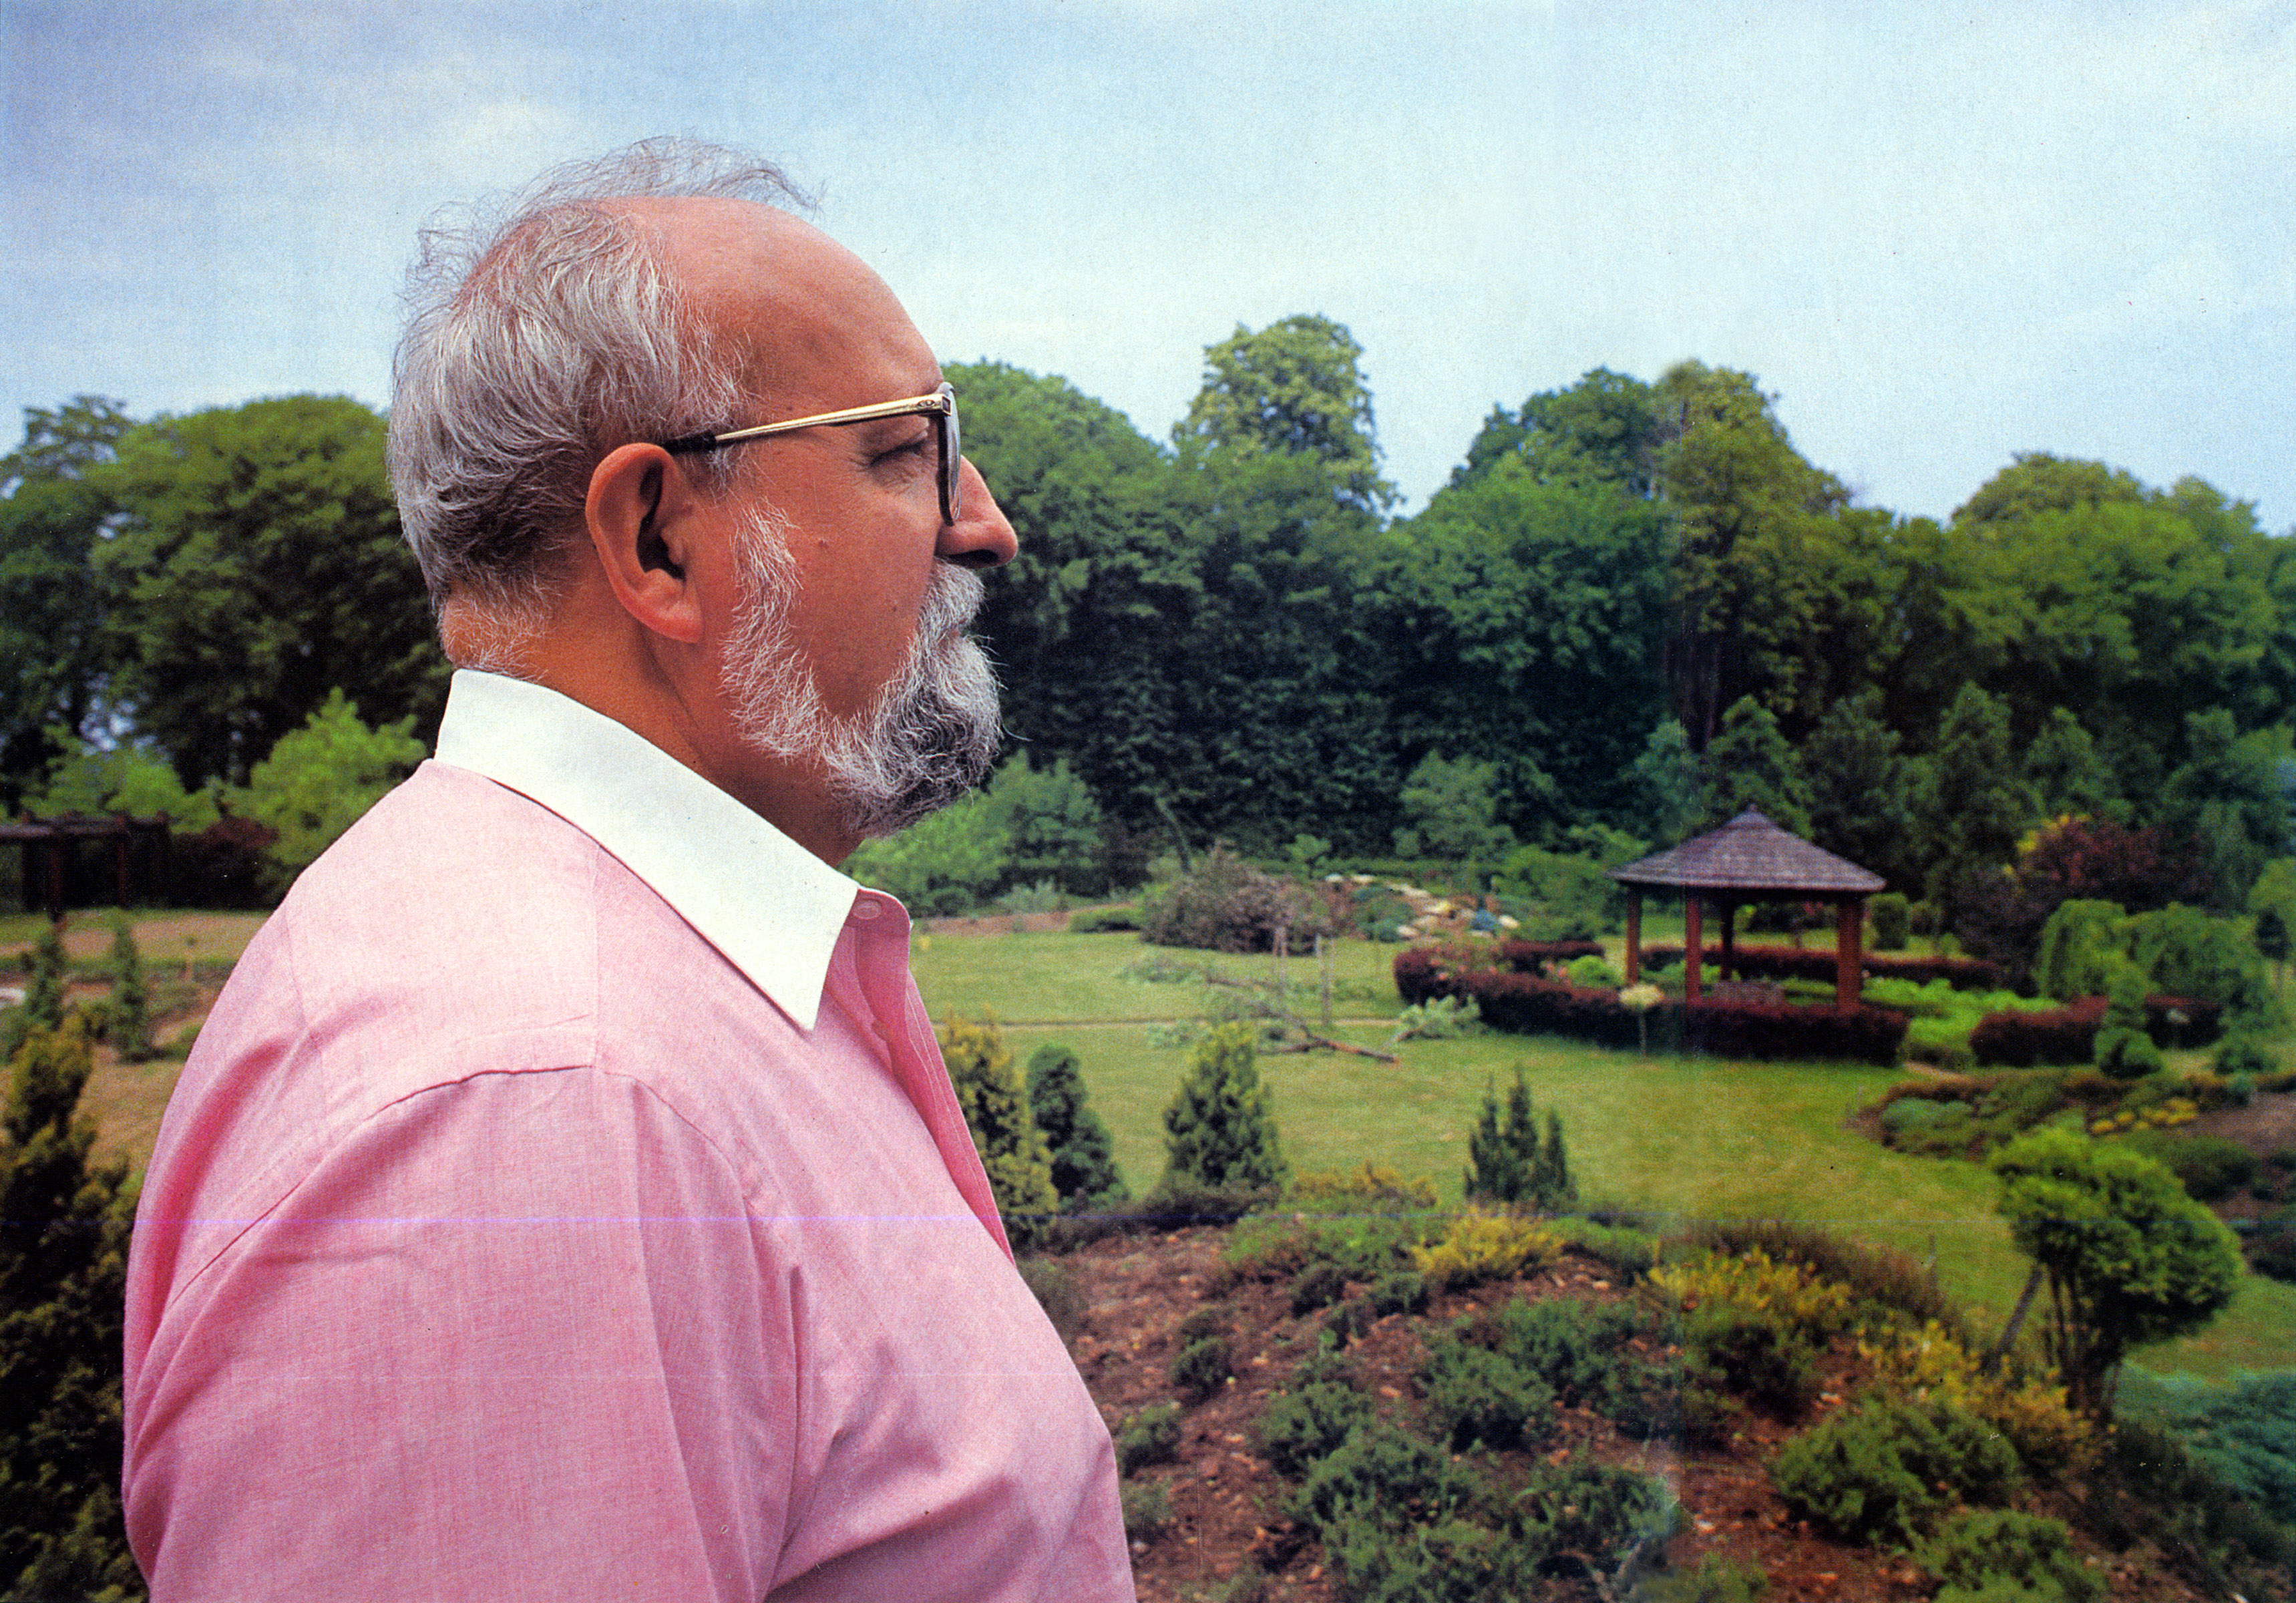 Krzysztof Penderecki Backgrounds on Wallpapers Vista